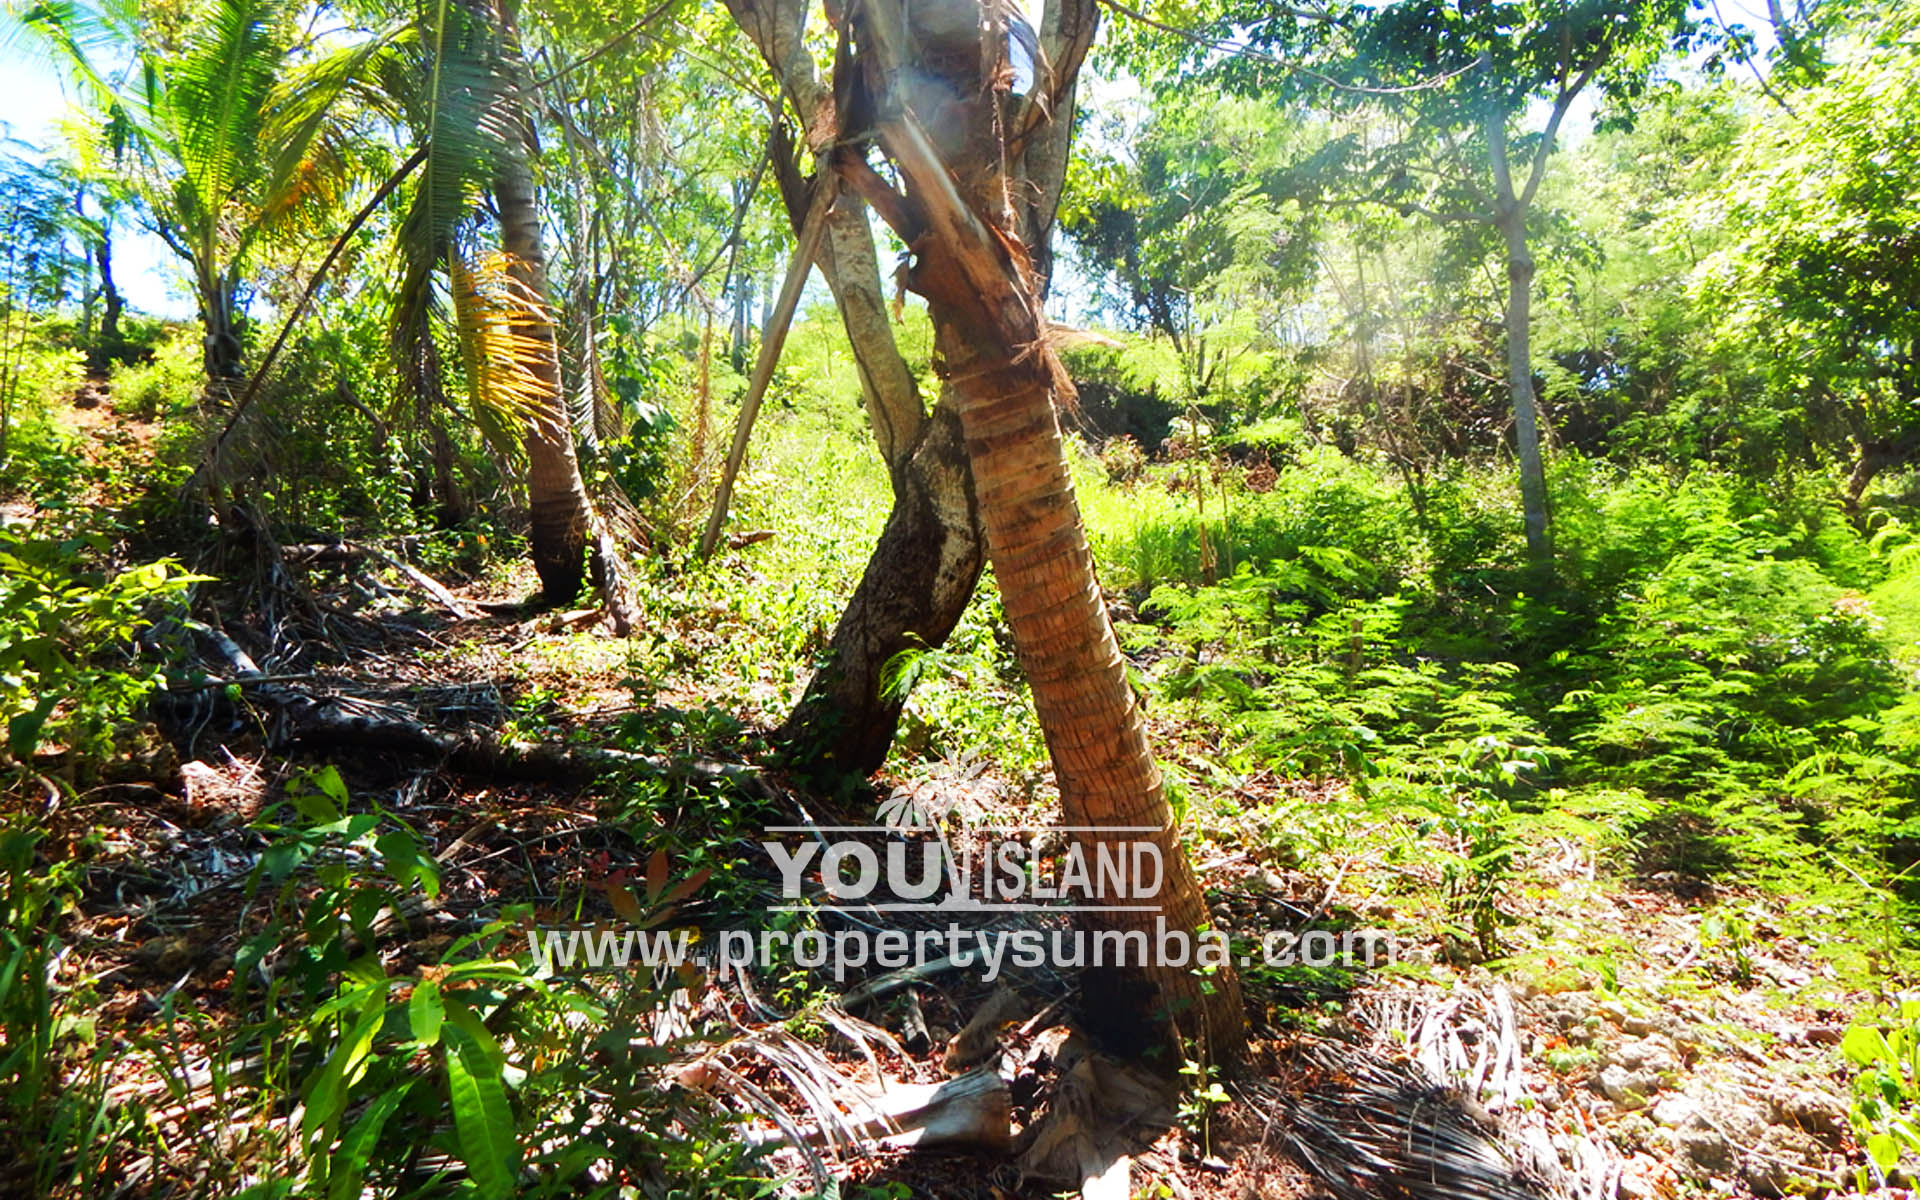 Property Sumba Dangla Rada 523 3057m2 6